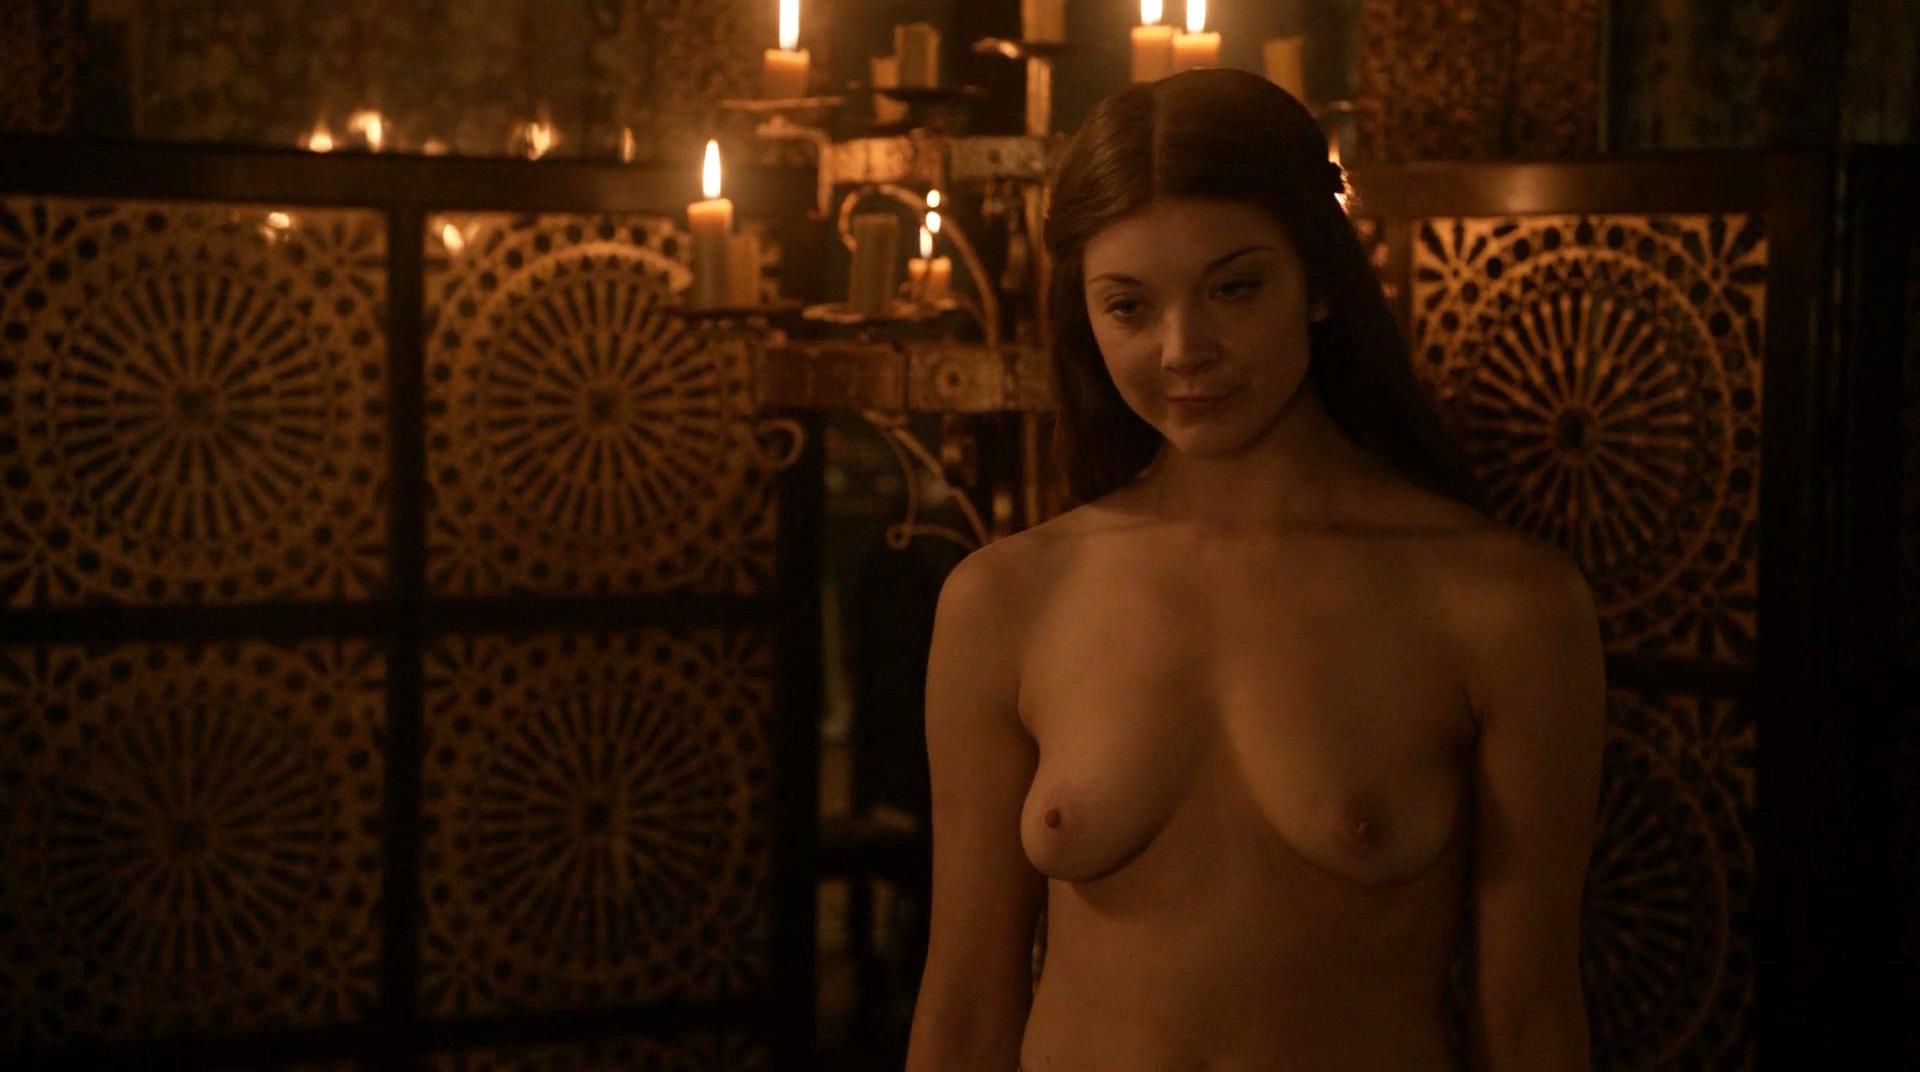 natalie dormer got nackt